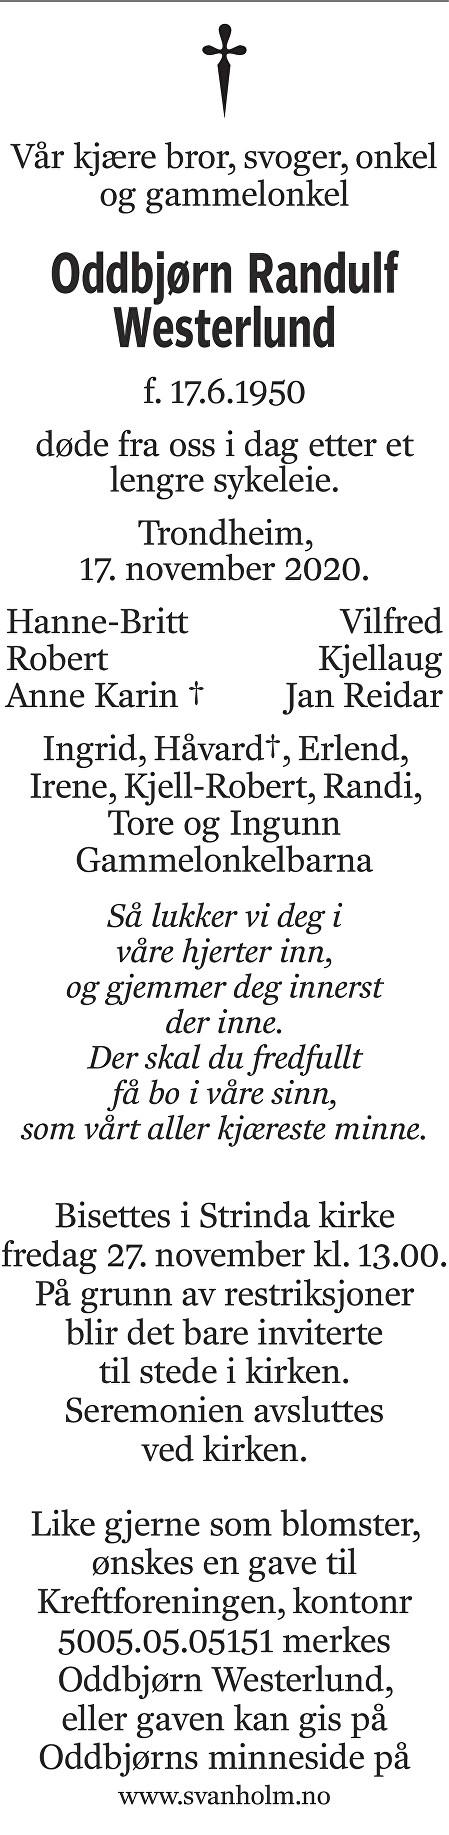 Oddbjørn Randulf Westerlund Dødsannonse